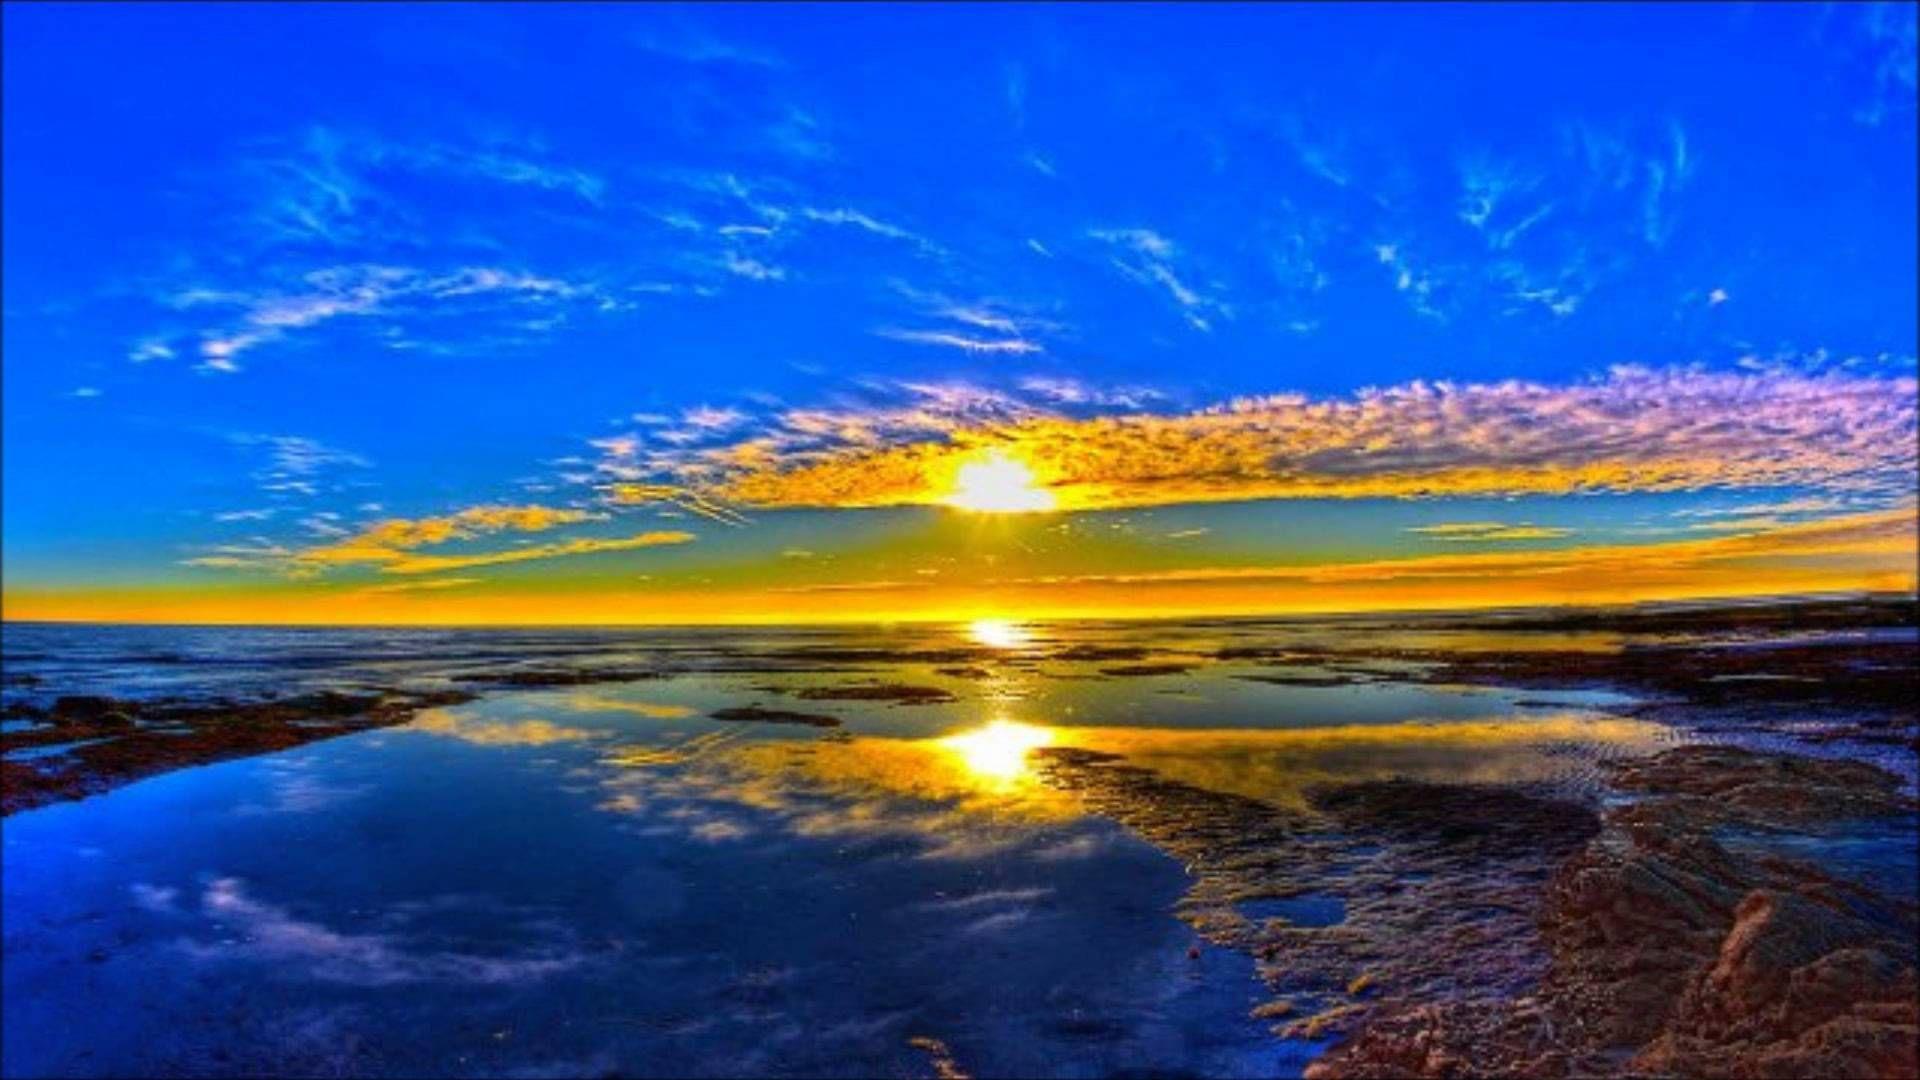 Beautiful Landscape Sunset